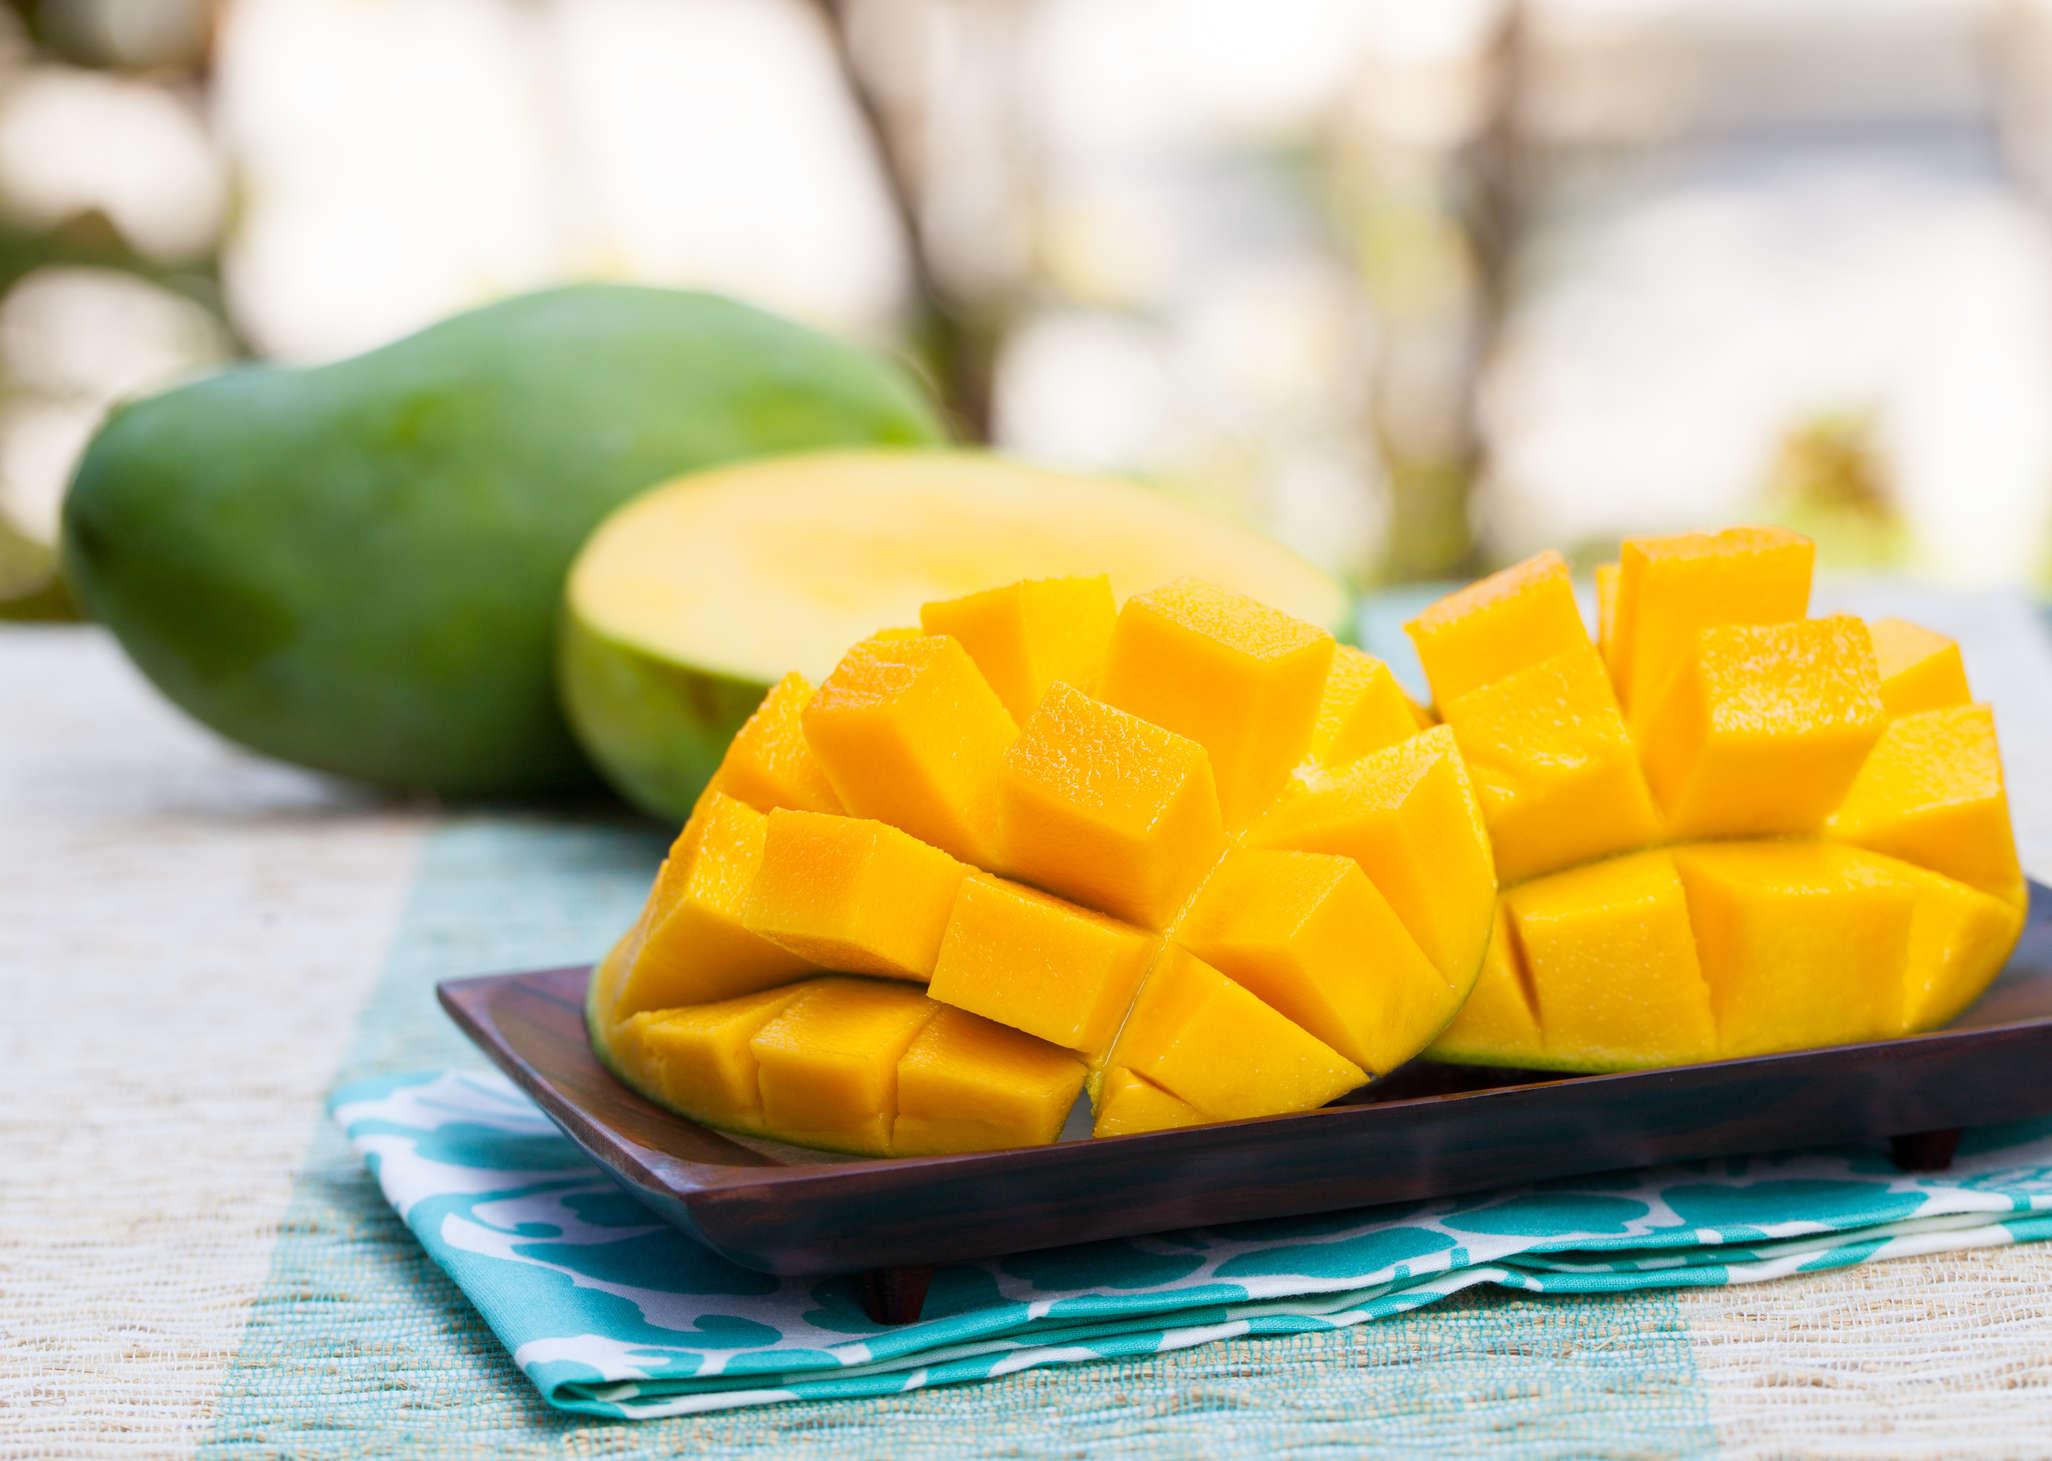 mango in a weight loss diet plan